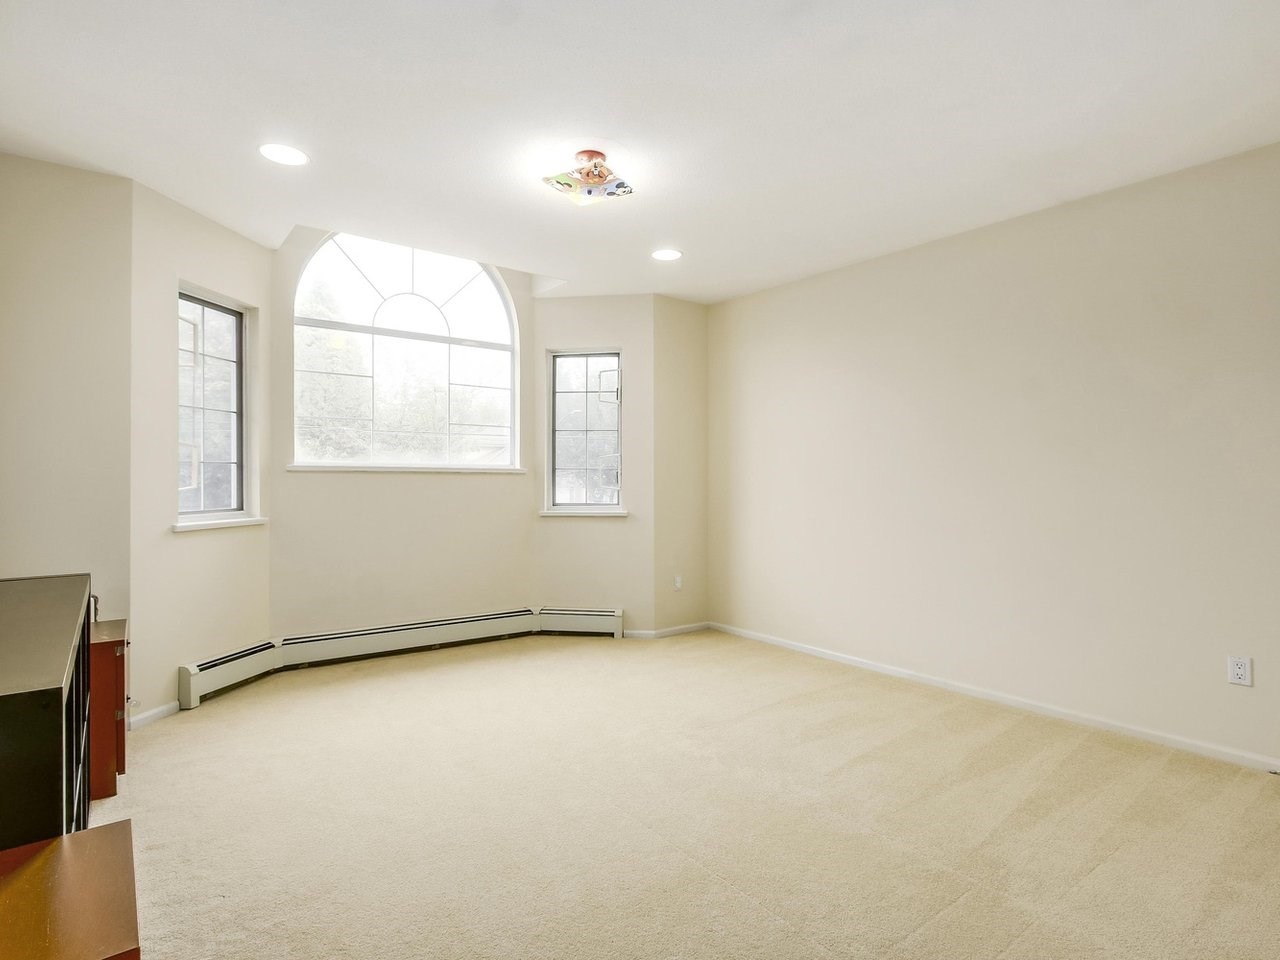 6762 Kitchener Street, Burnaby — For Sale @ $1,660,000 | Zolo.ca